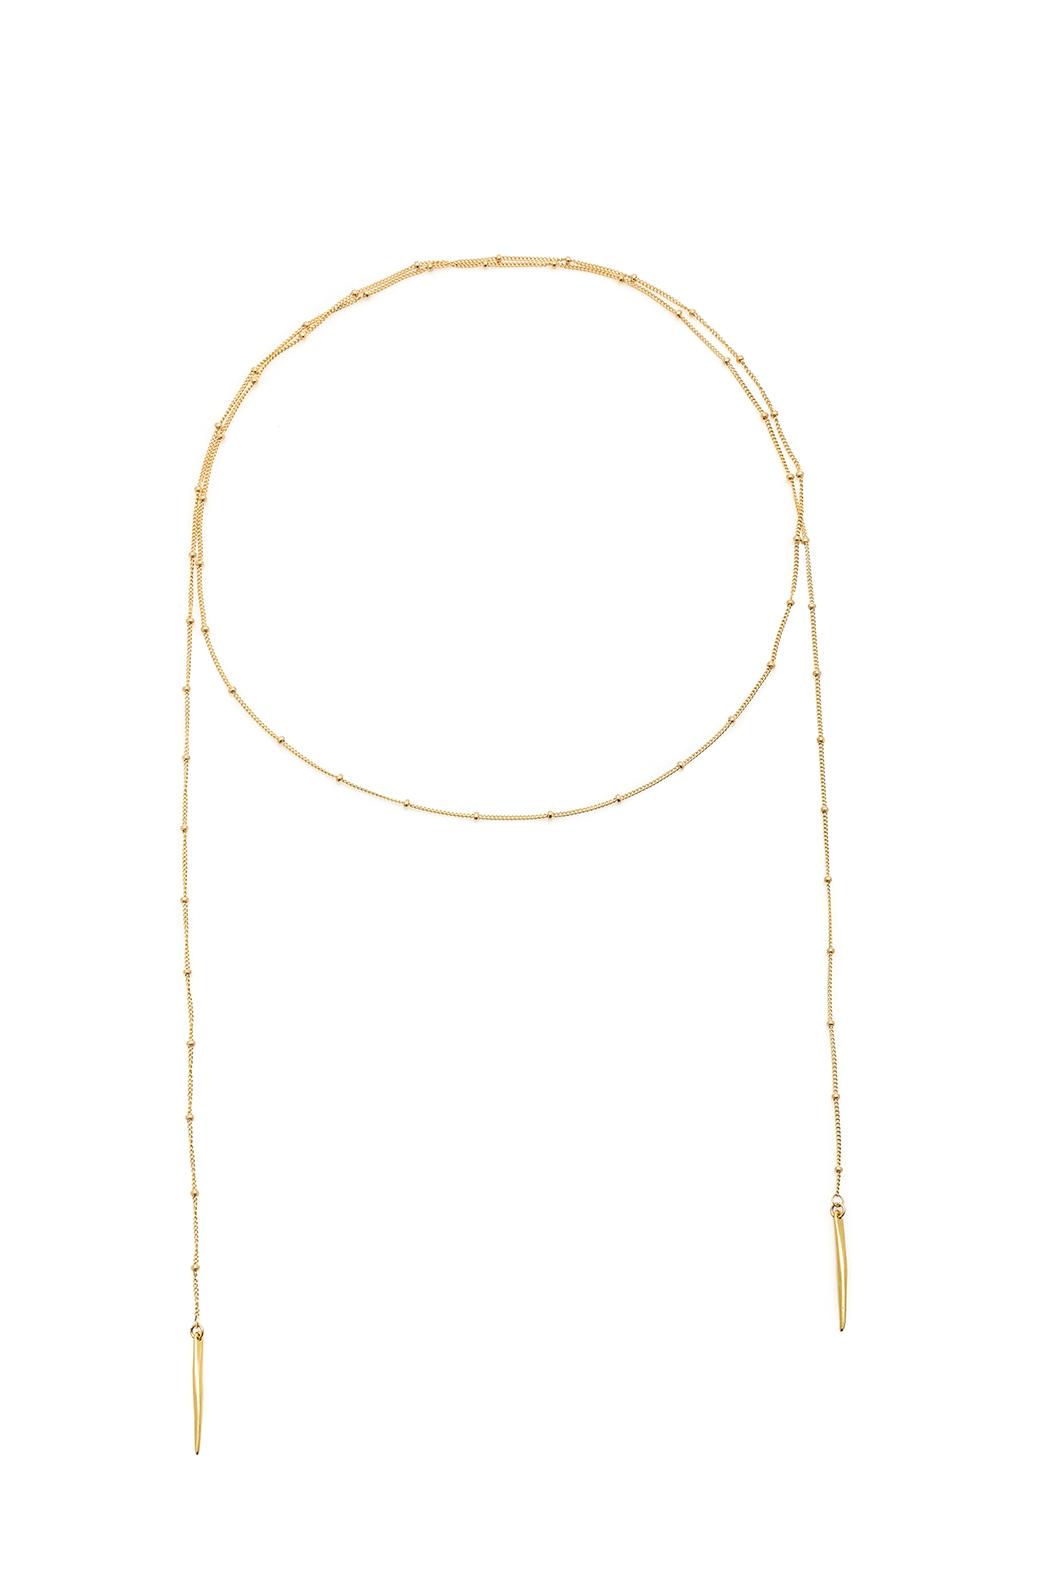 melene-kent-jewels-erin-lariat-necklace-0e150139_l.jpg